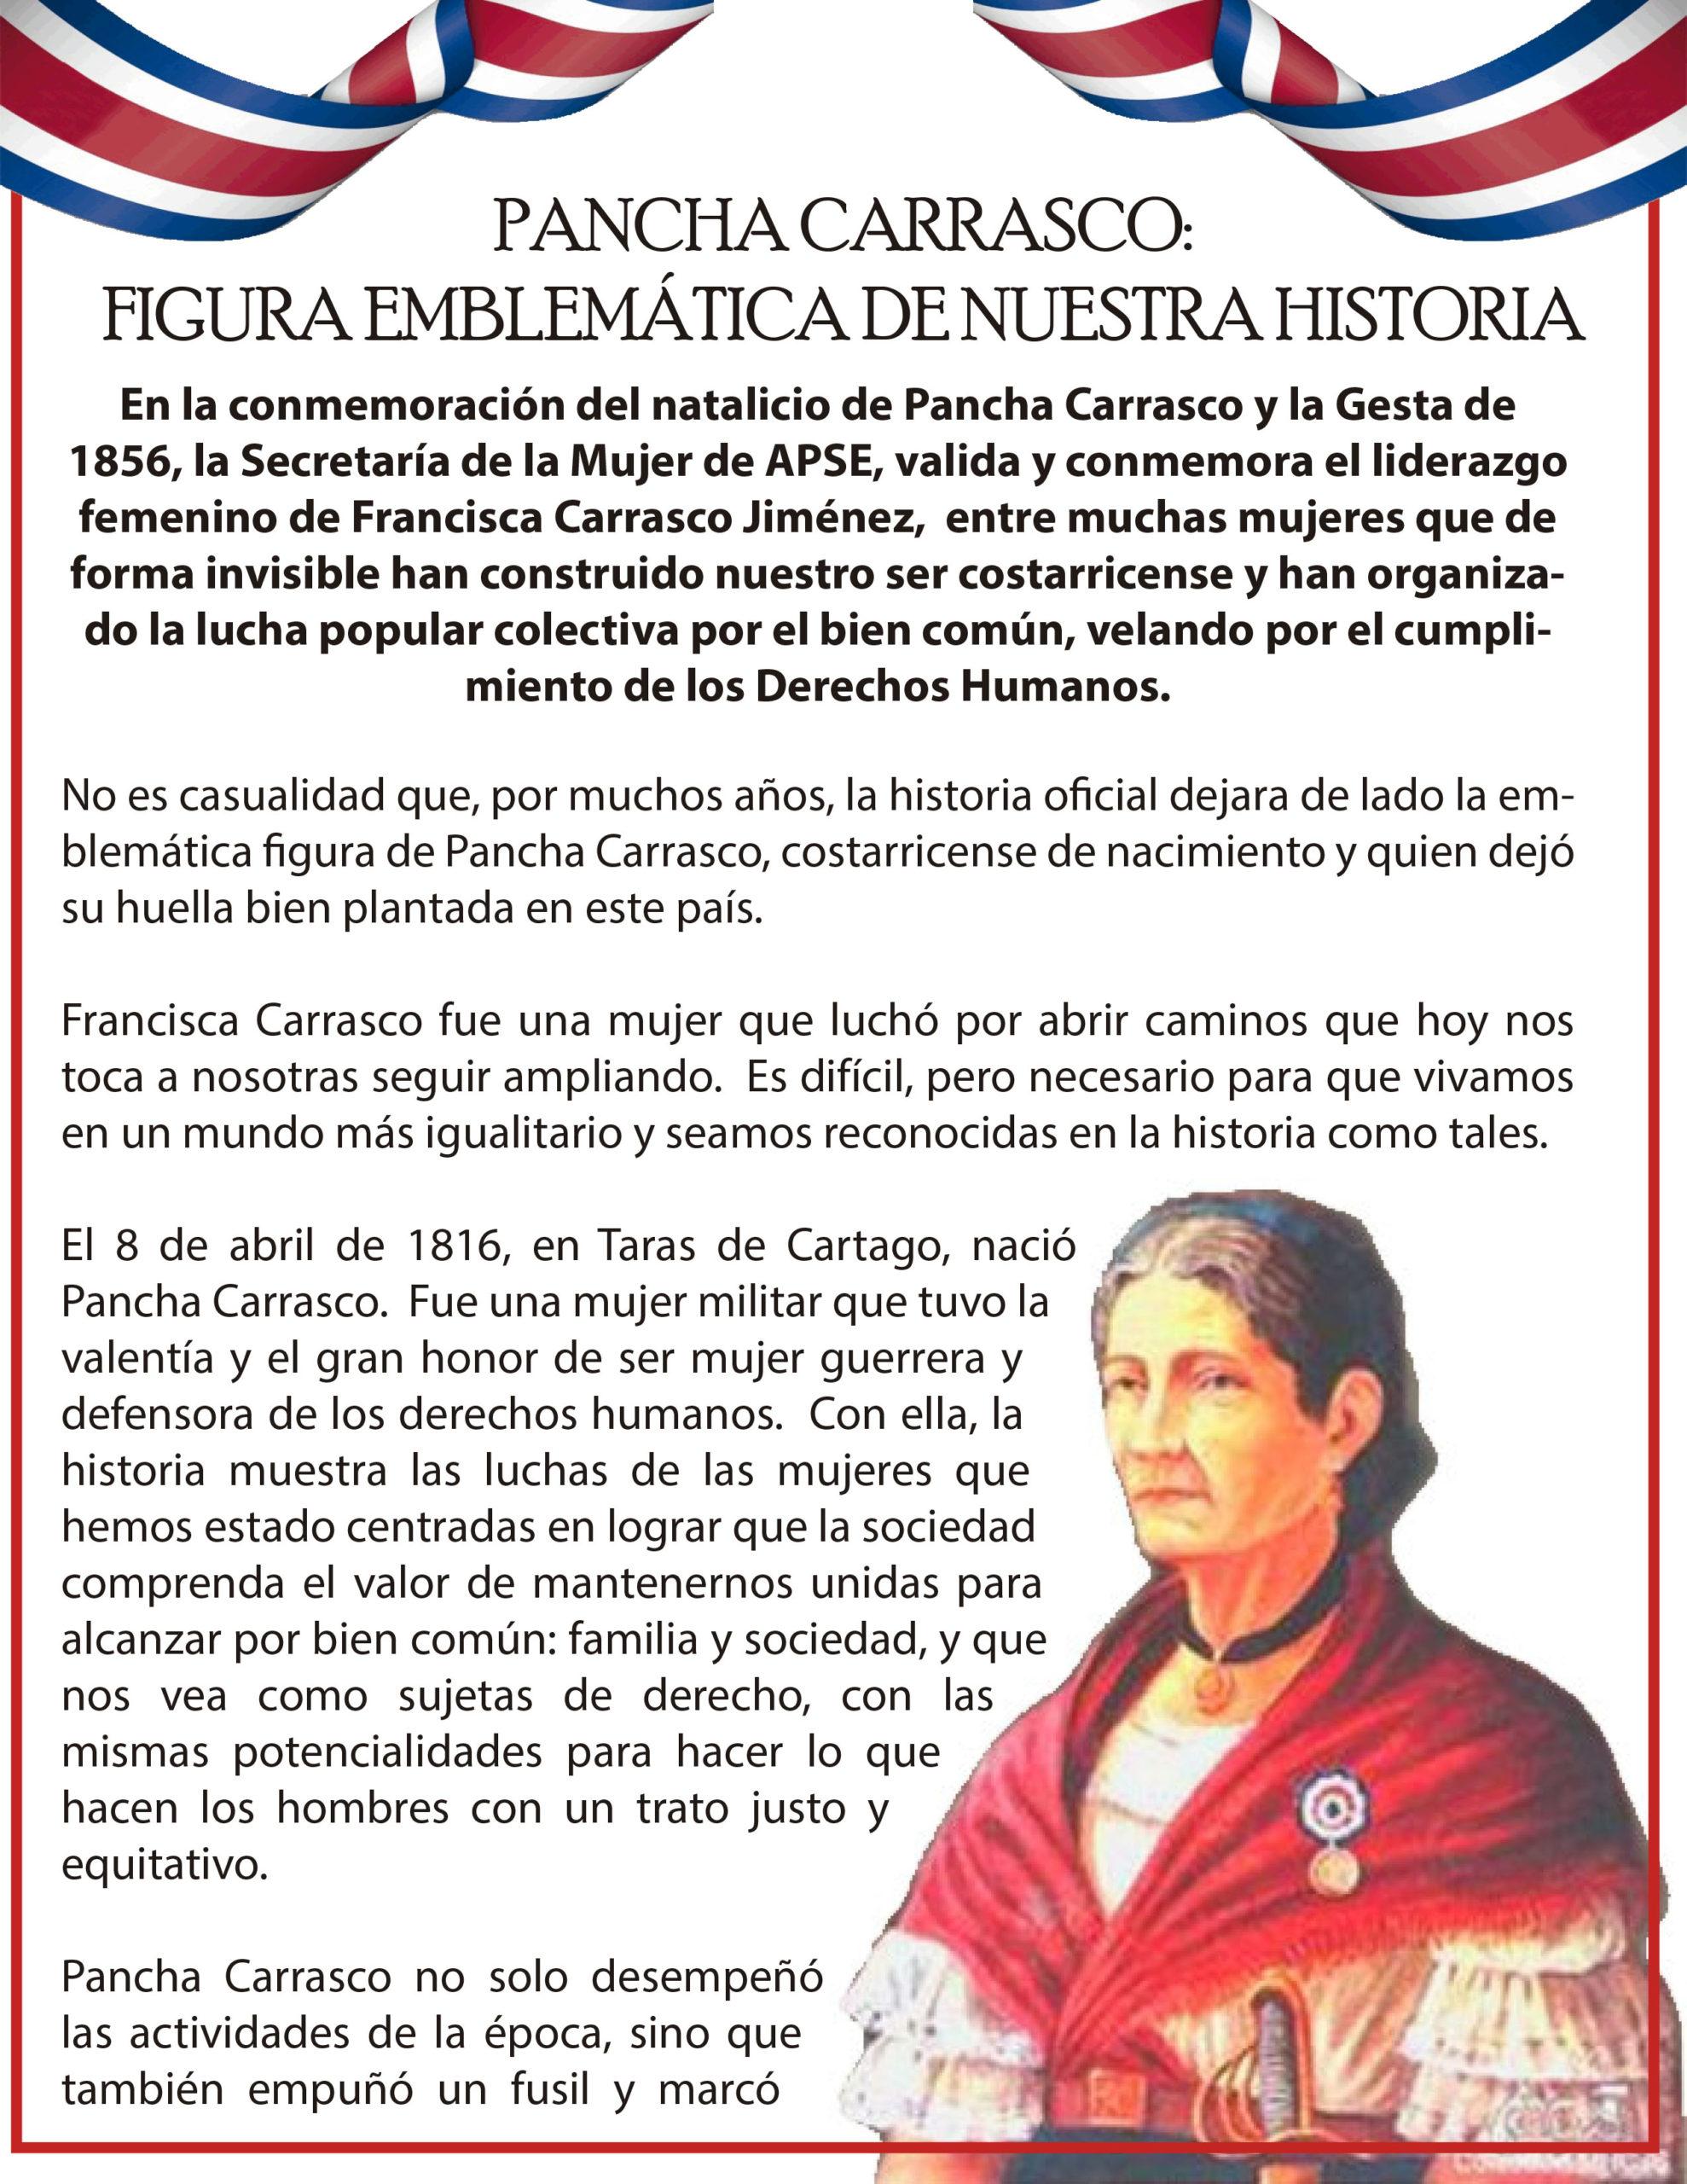 PANCHA CARRASCO: FIGURA EMBLEMÁTICA DE NUESTRA HISTORIA